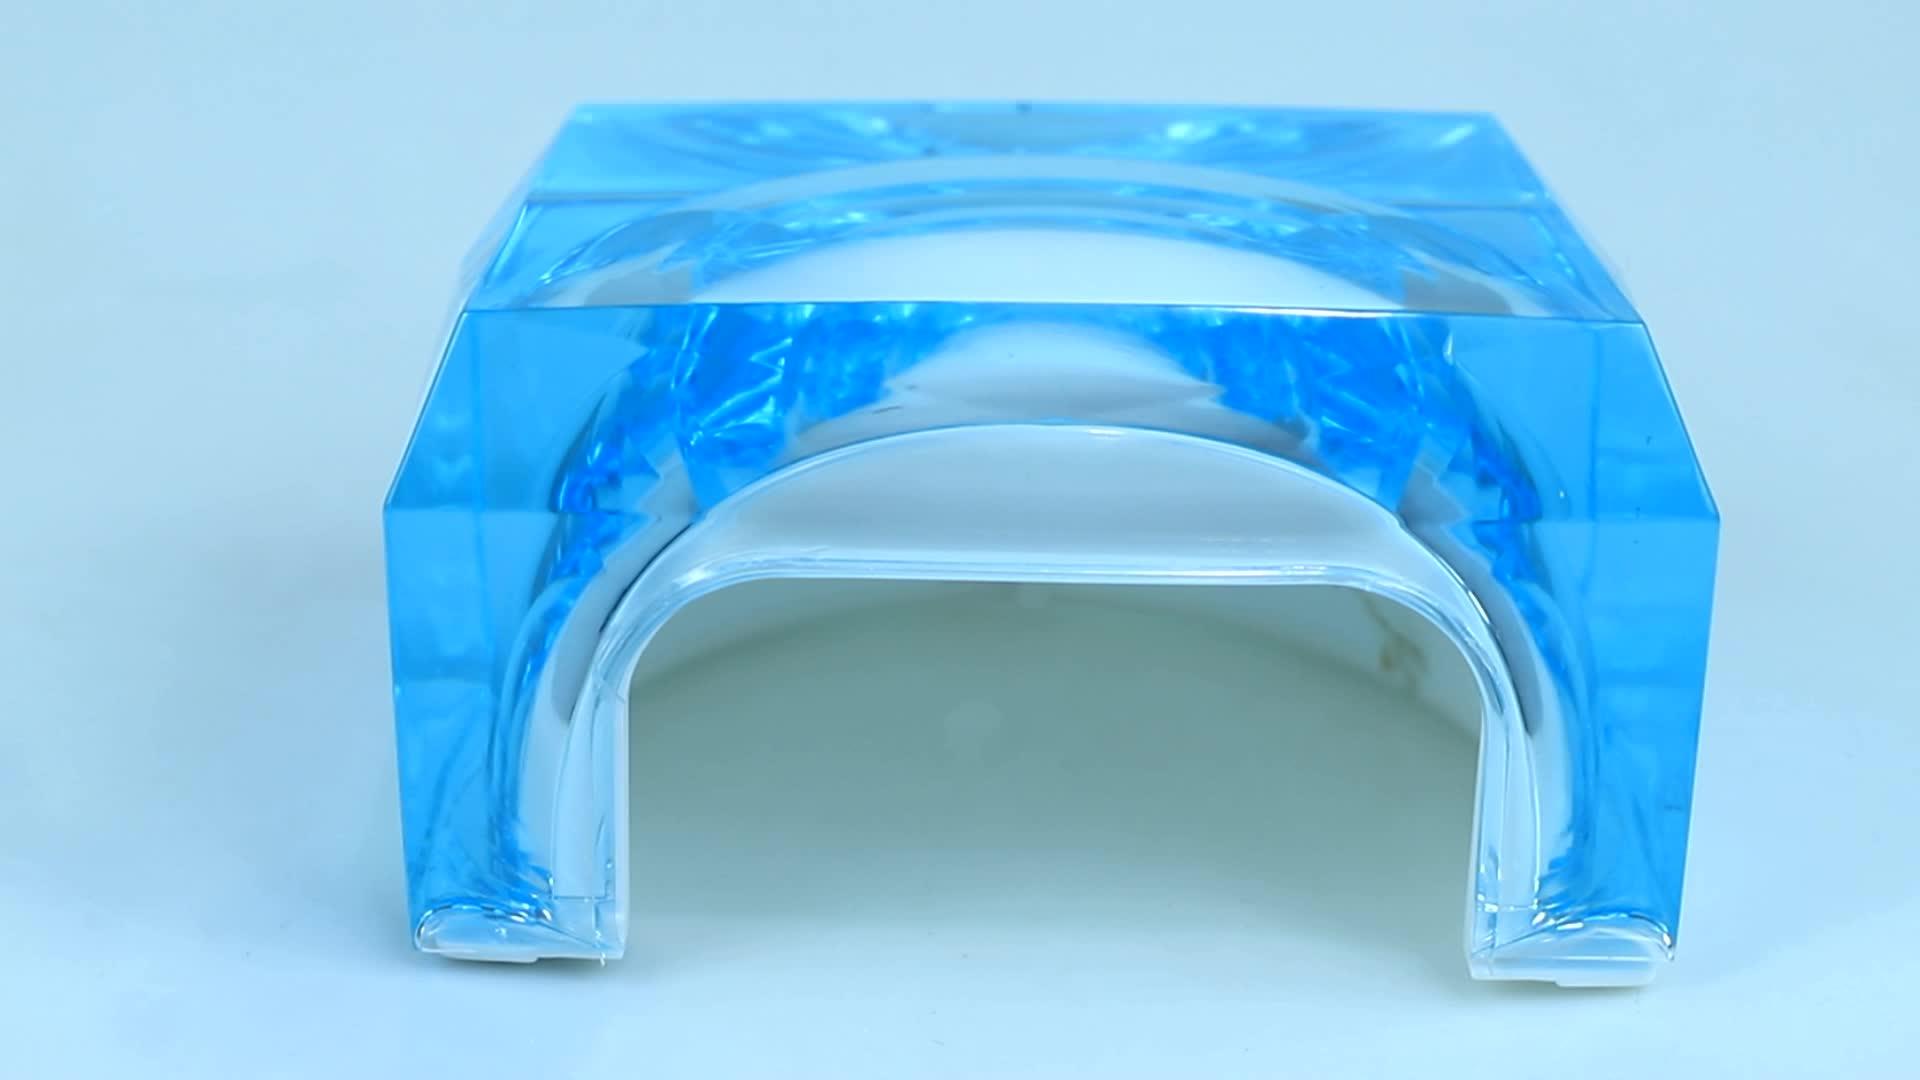 2020 New Design Transparent Professional Uv Led Nail Lamp, Electric Hot Sell Acrylic Nail Drying Lamp